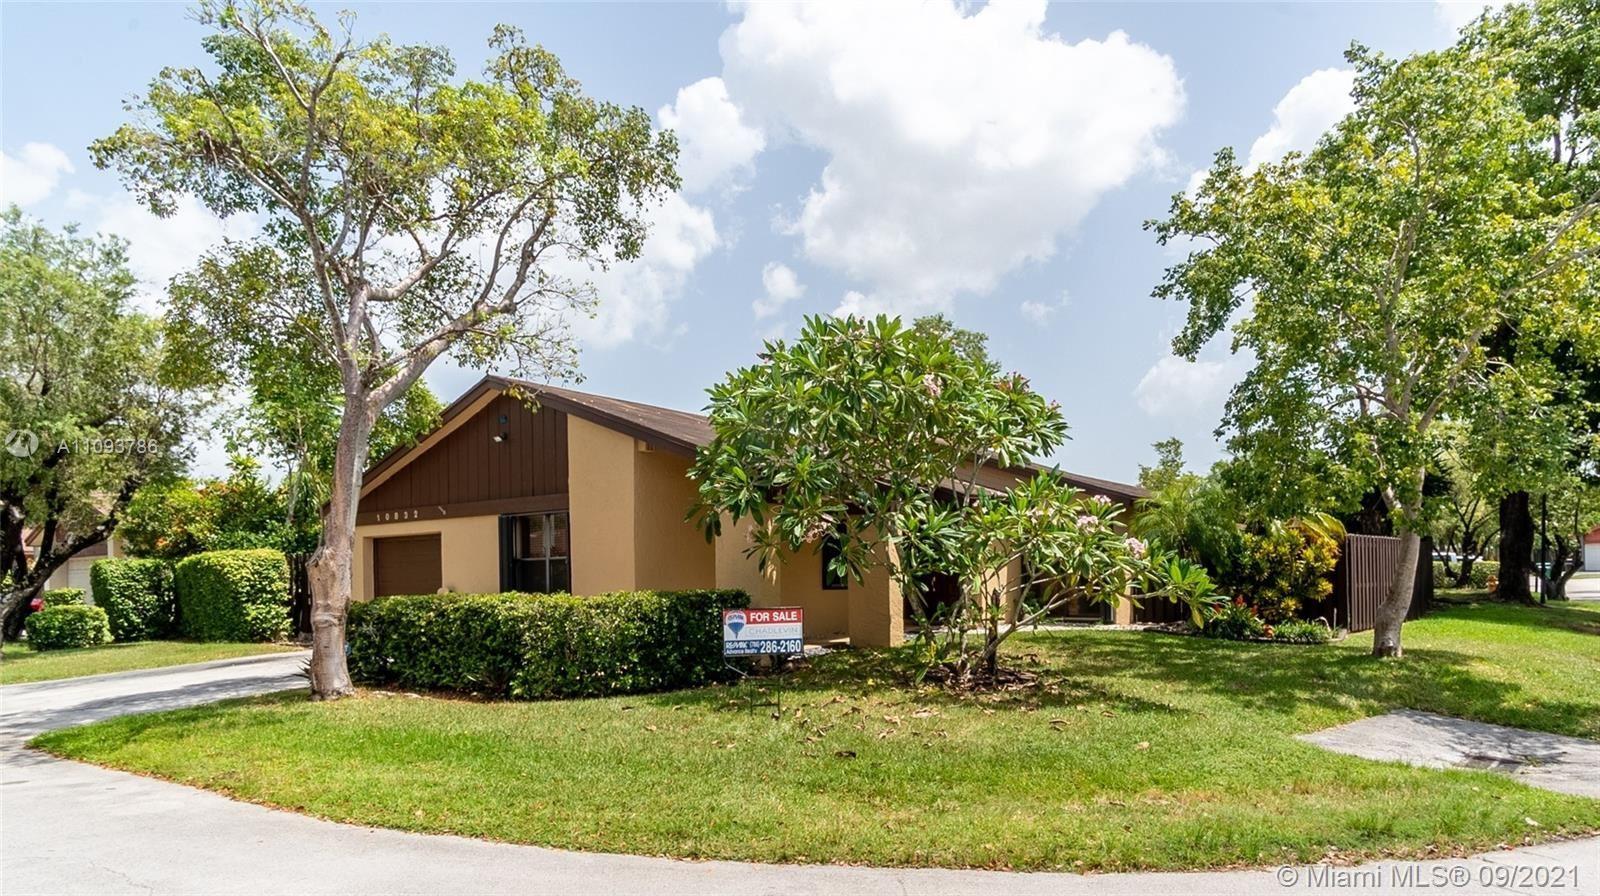 10832 SW 132nd Circle Ct, Miami, FL 33186 - #: A11093786